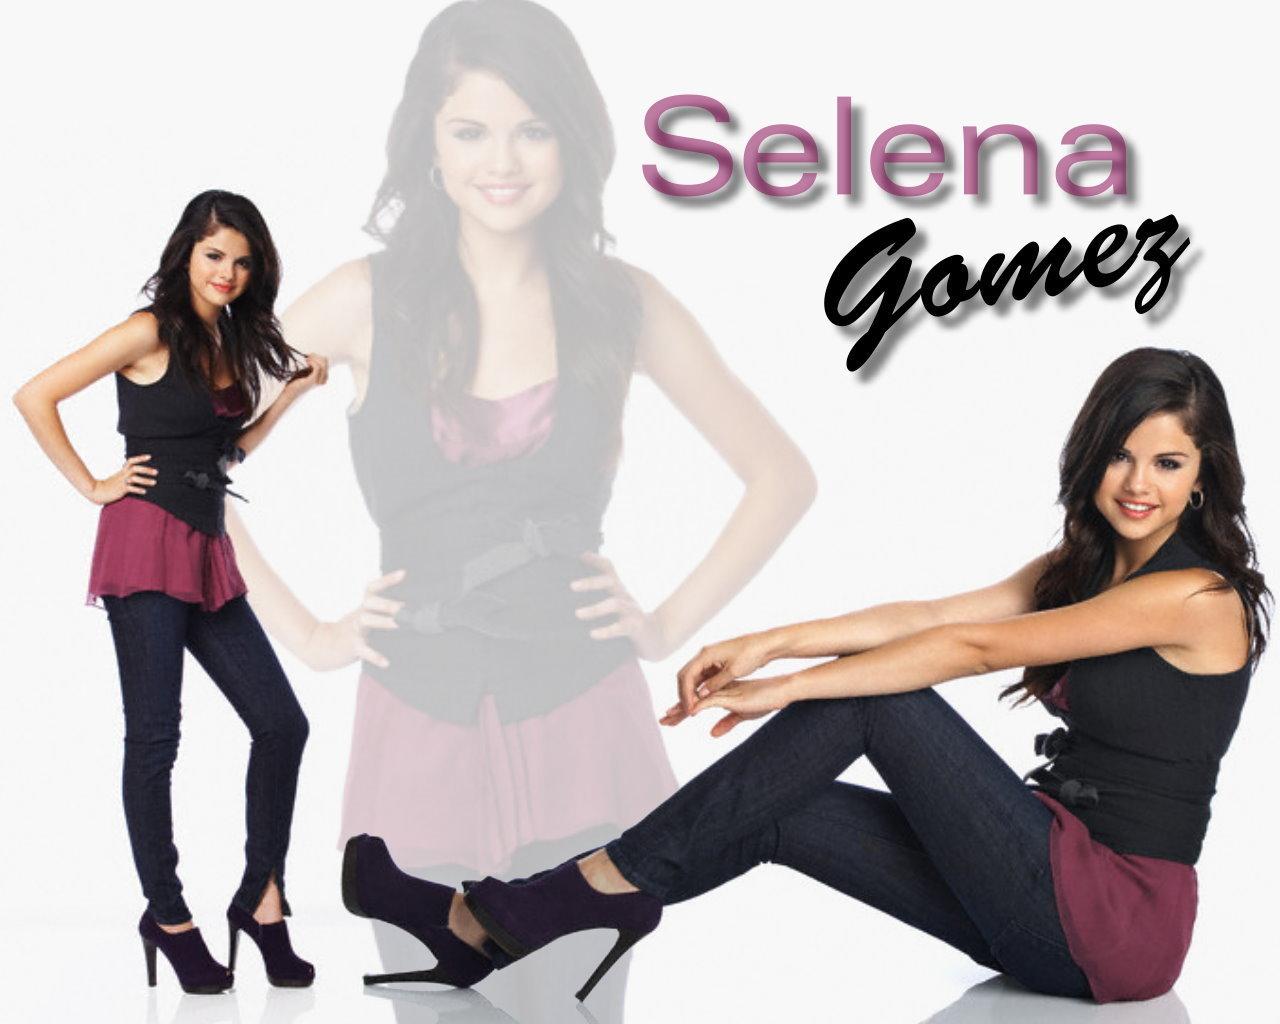 Selena Gomez Wallpapers for Desktop BackgroundMusic Wallpapers 1280x1024